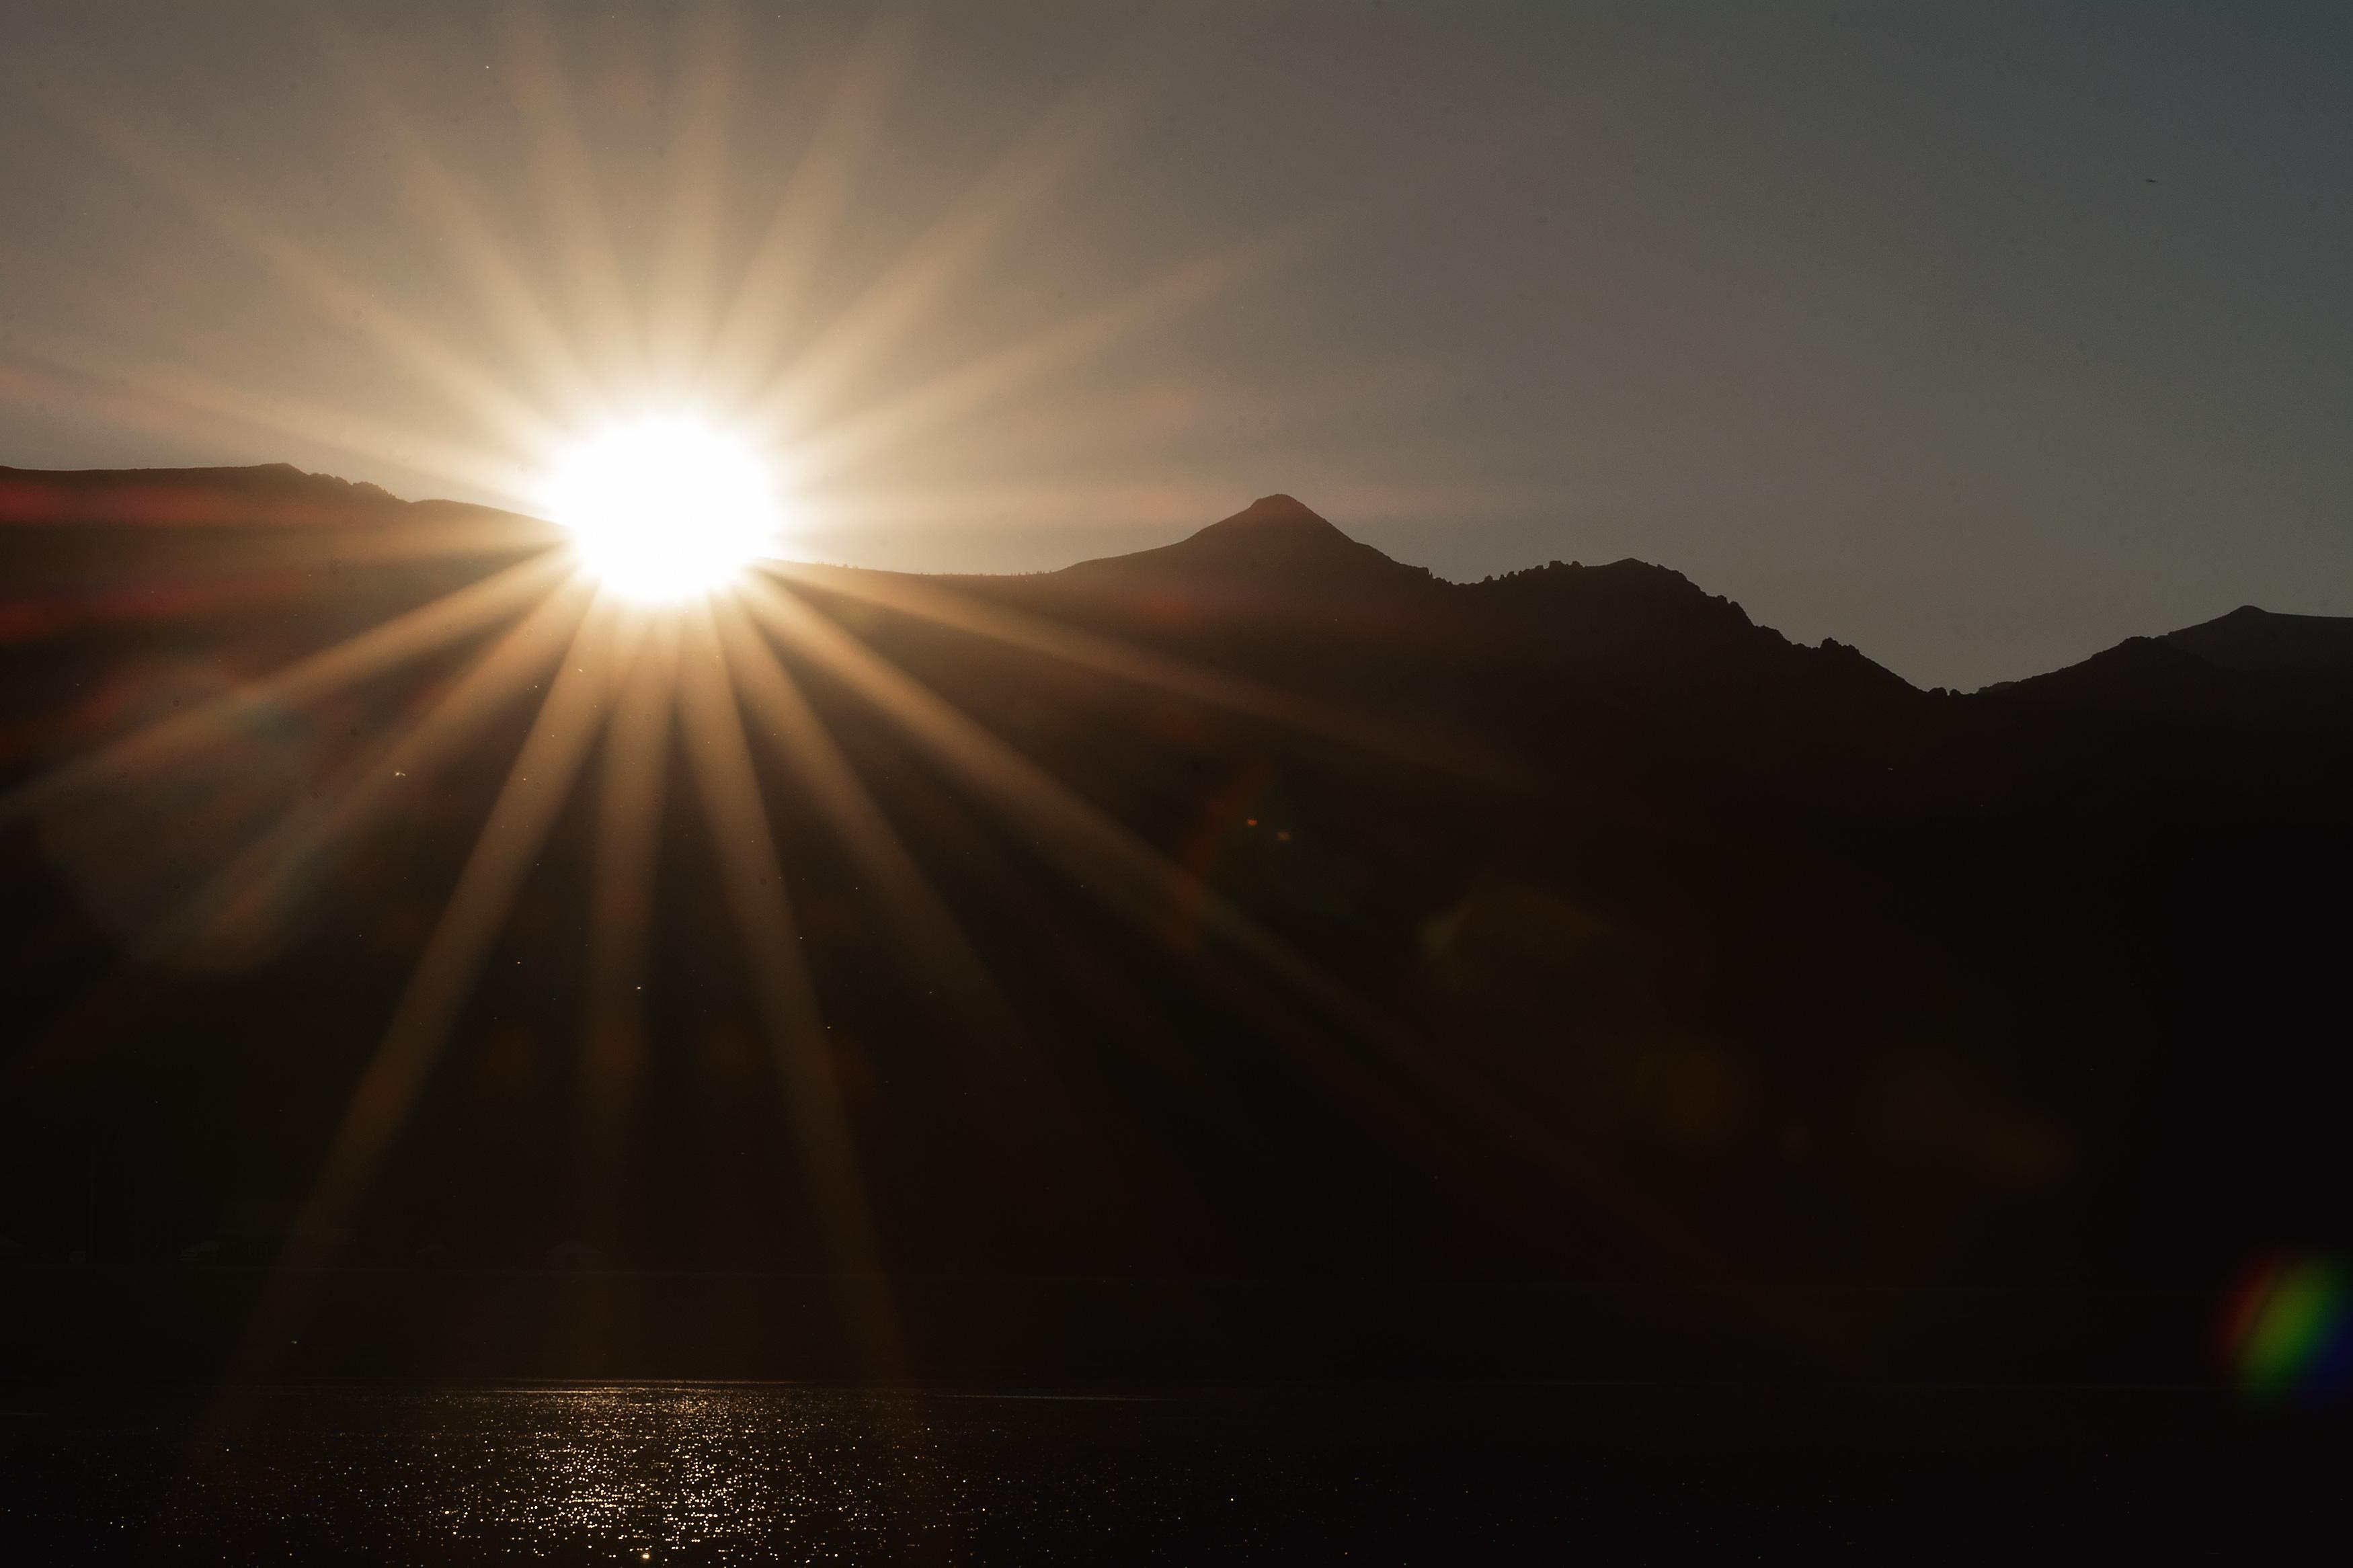 Sunset Sun Rays Over Mountains | Free Stock Photo | LibreShot